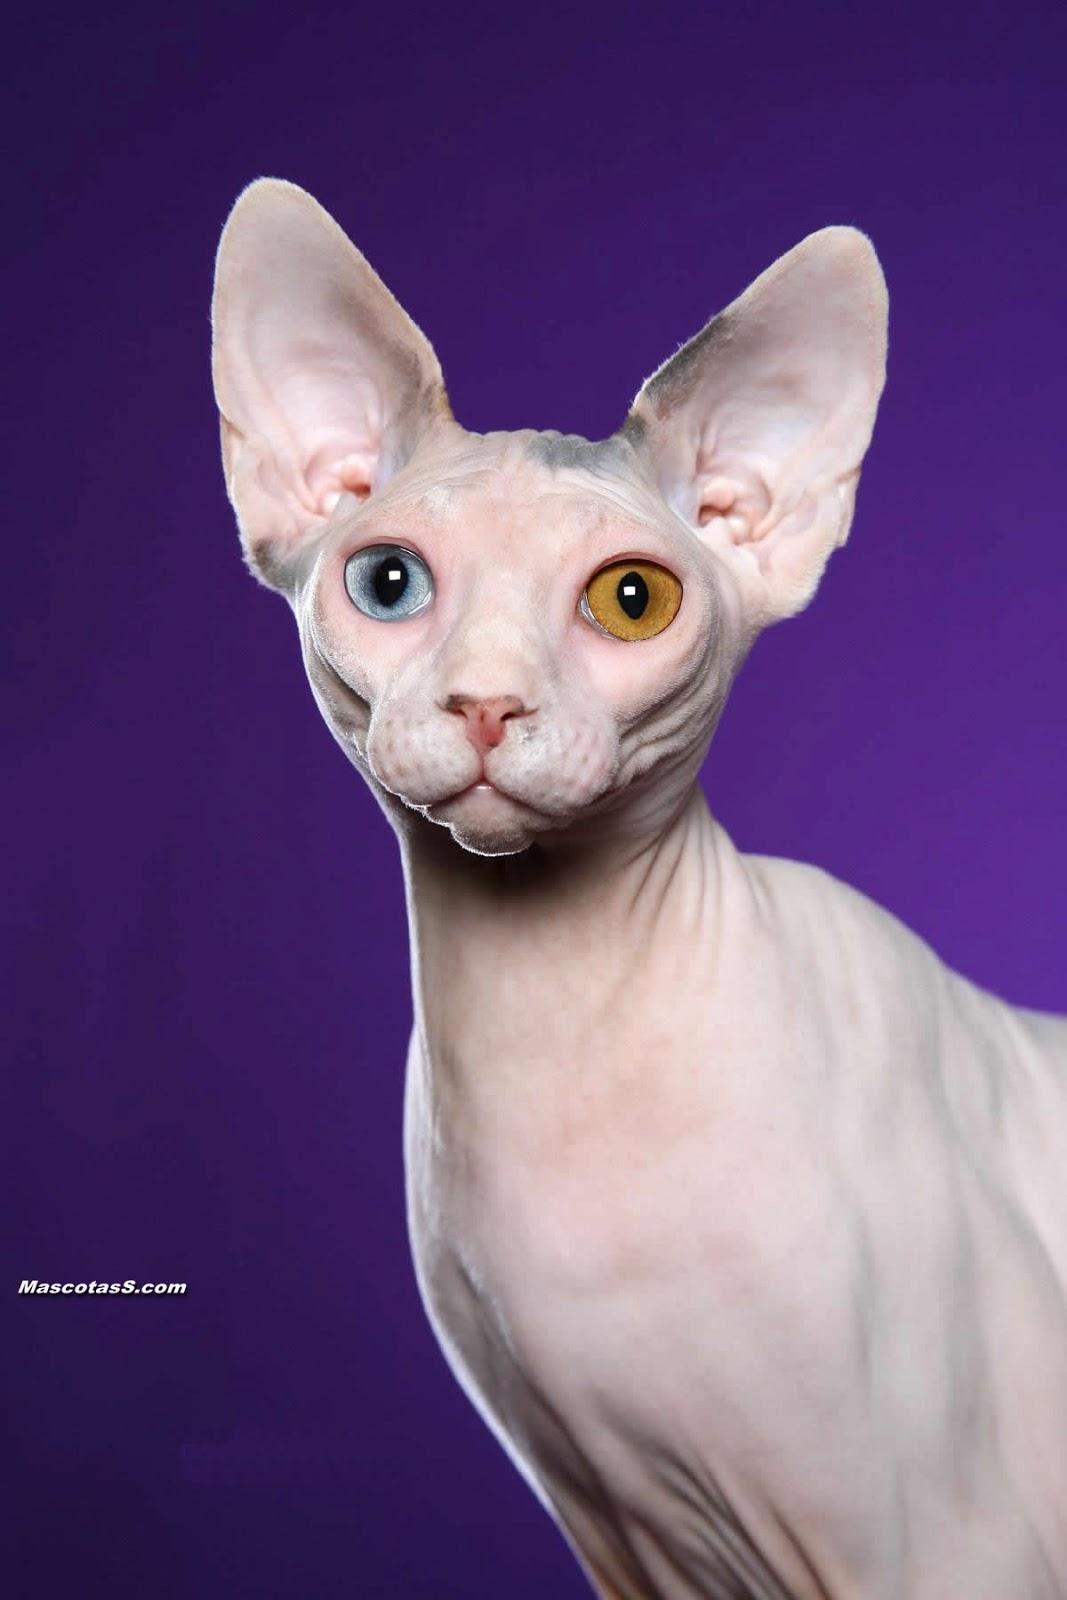 Egyptian Sphynx Cat For Sale